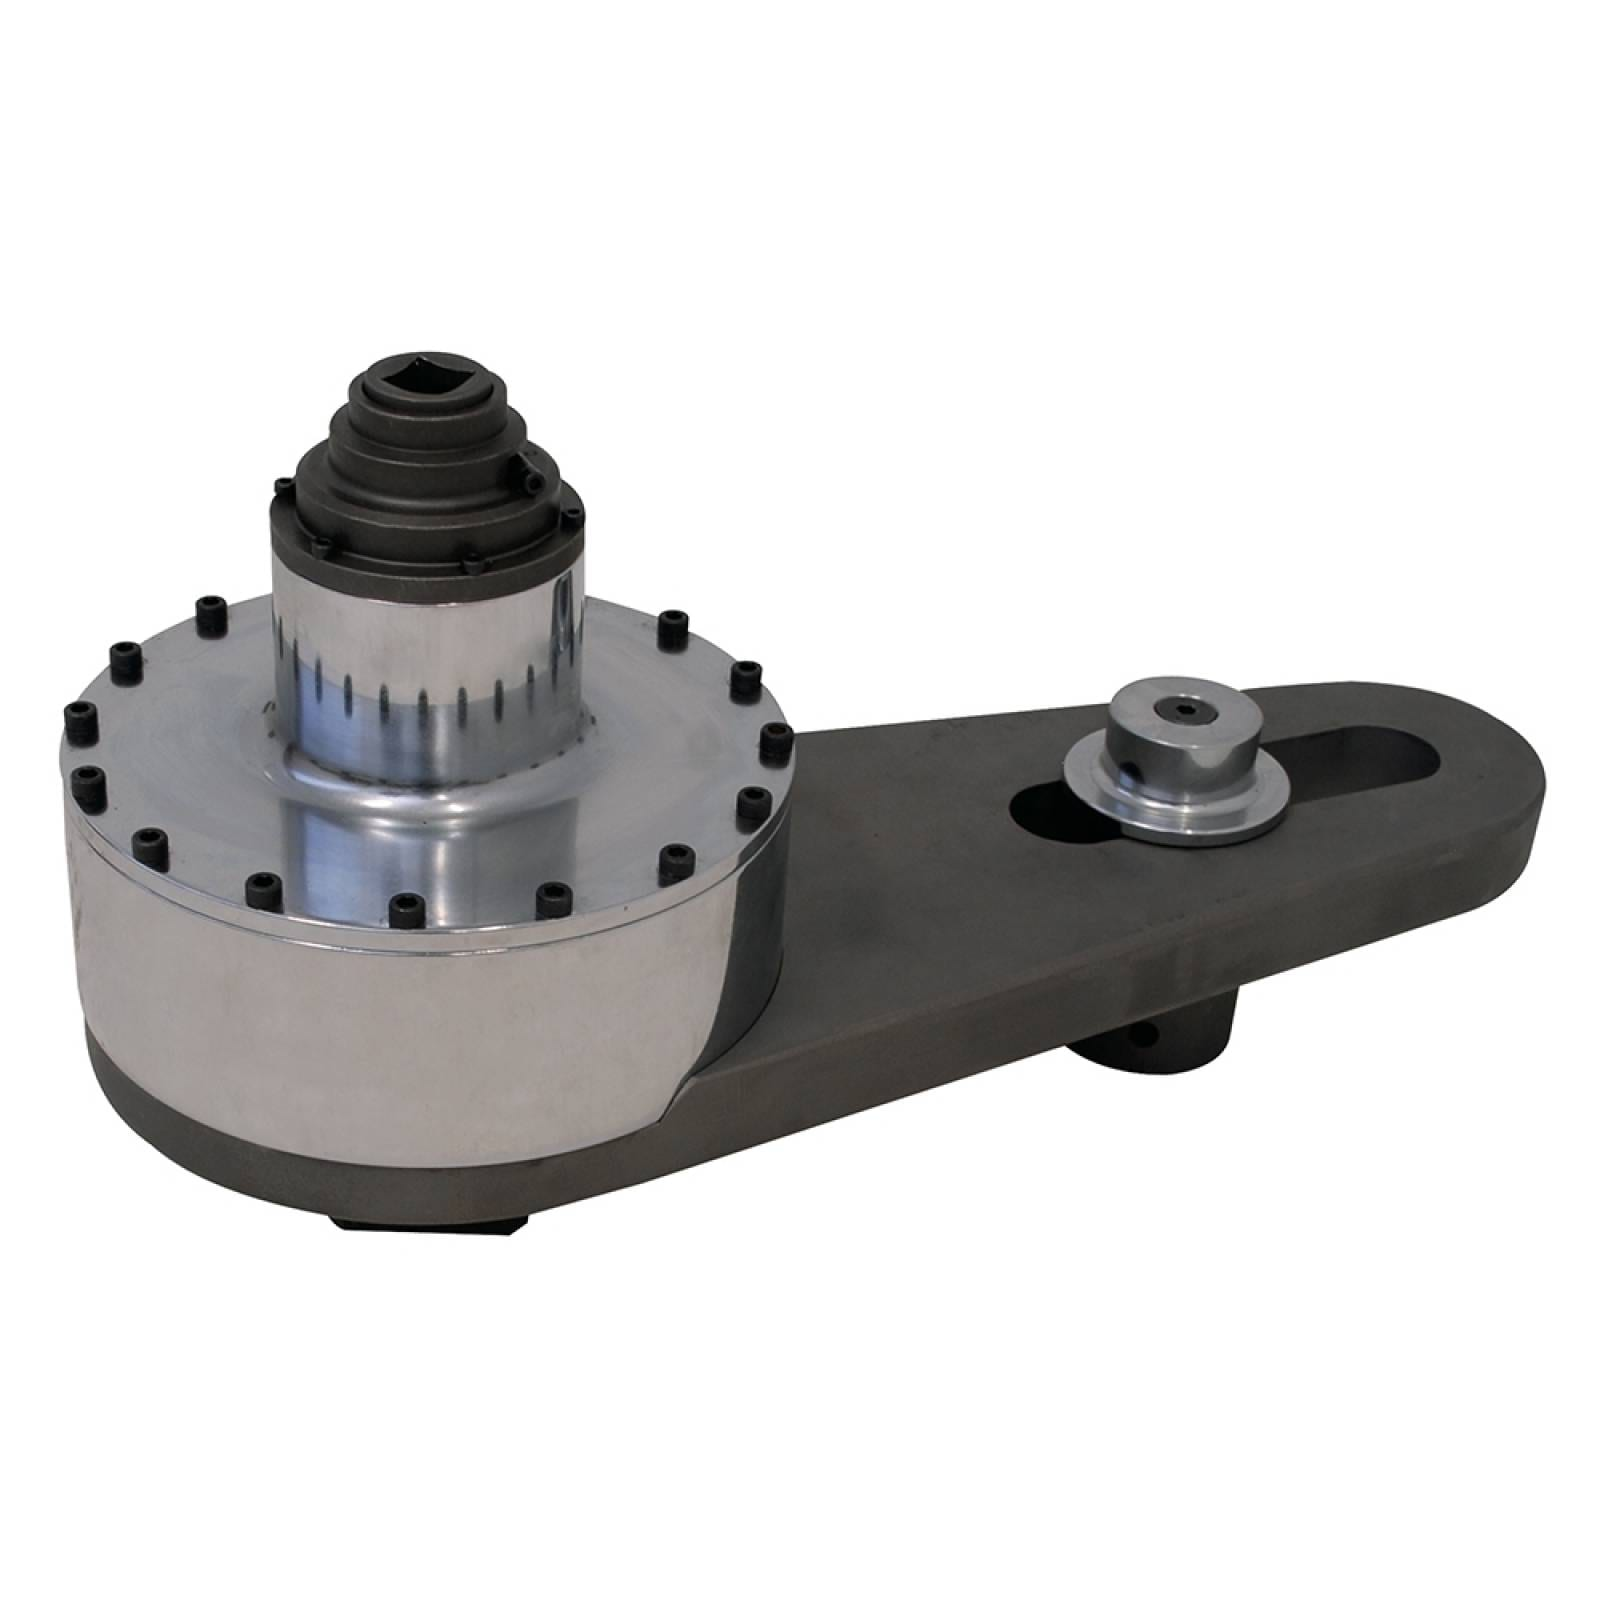 Multiplicador de torque de reacción esclava 8000ft-lb 6252 Urrea